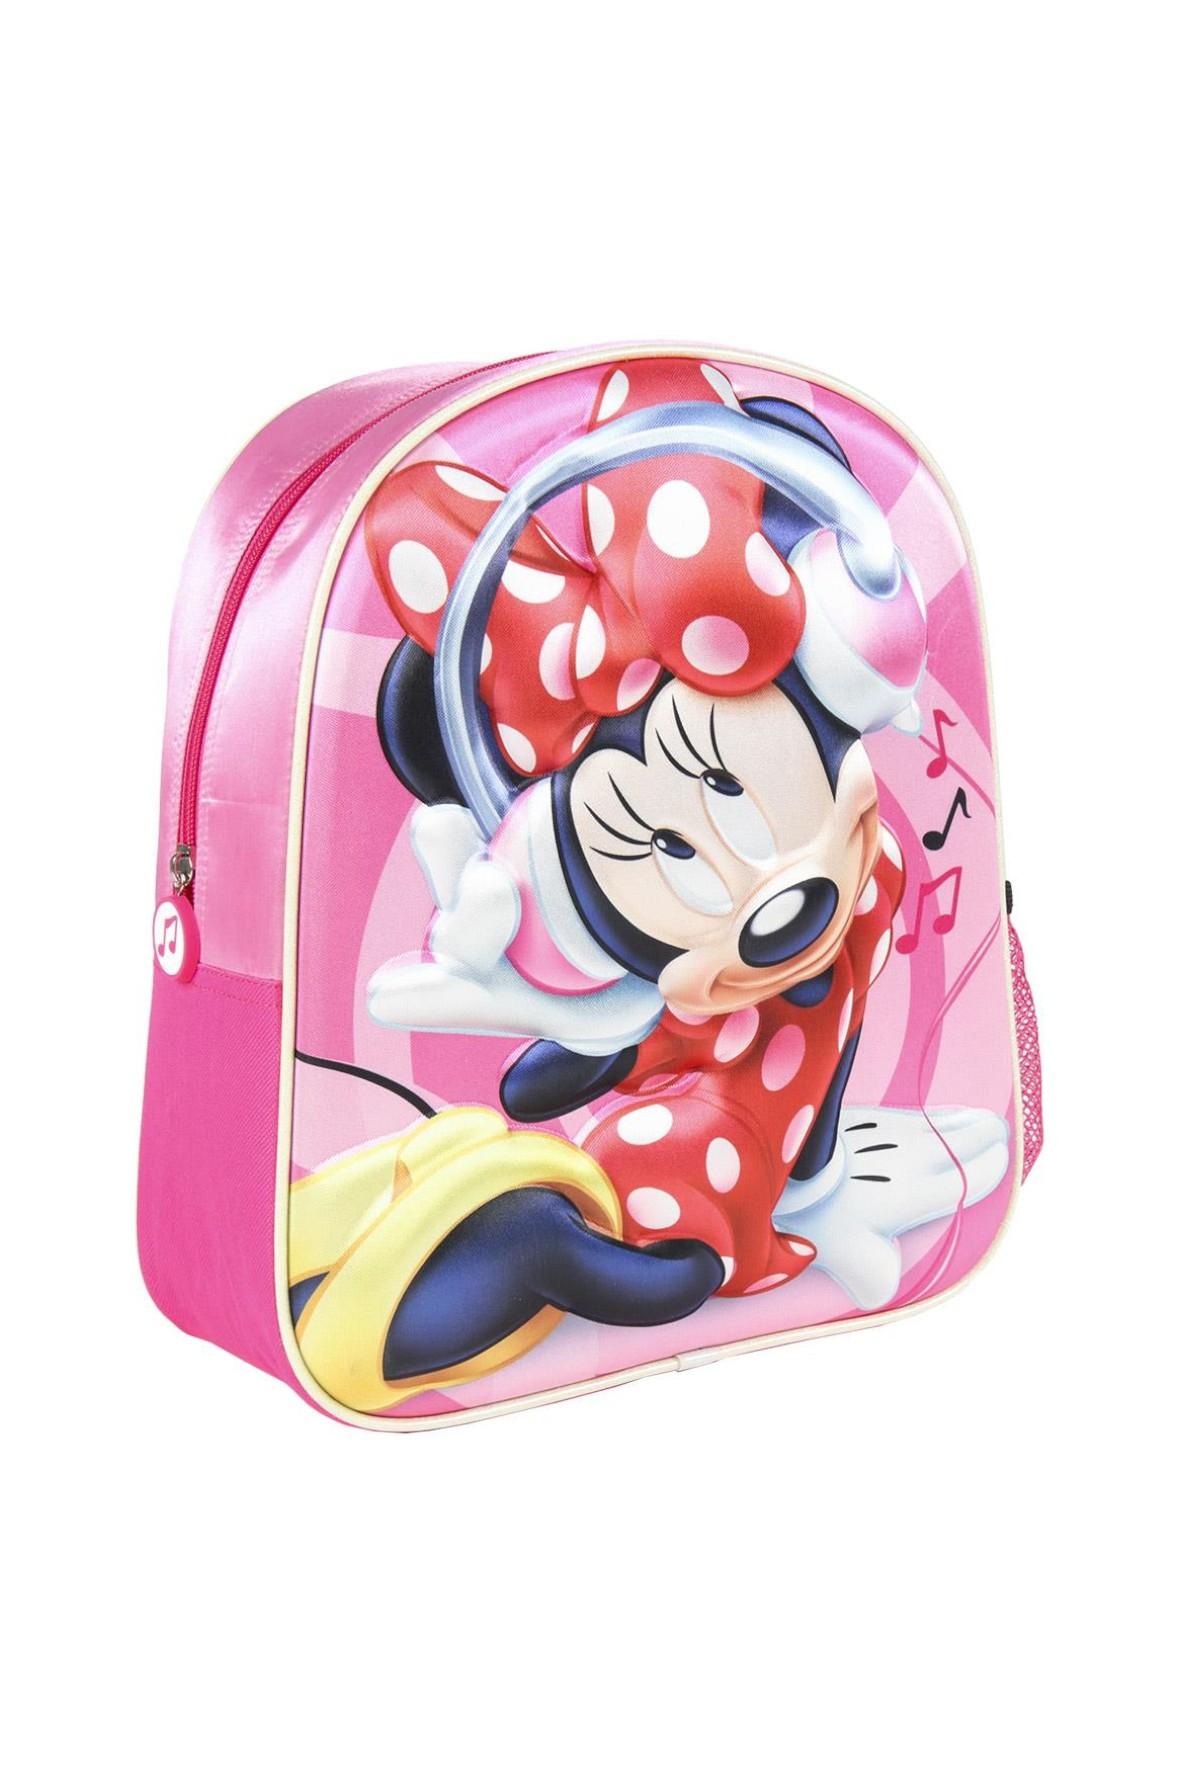 Plecak 3D Myszka Minnie - różowy